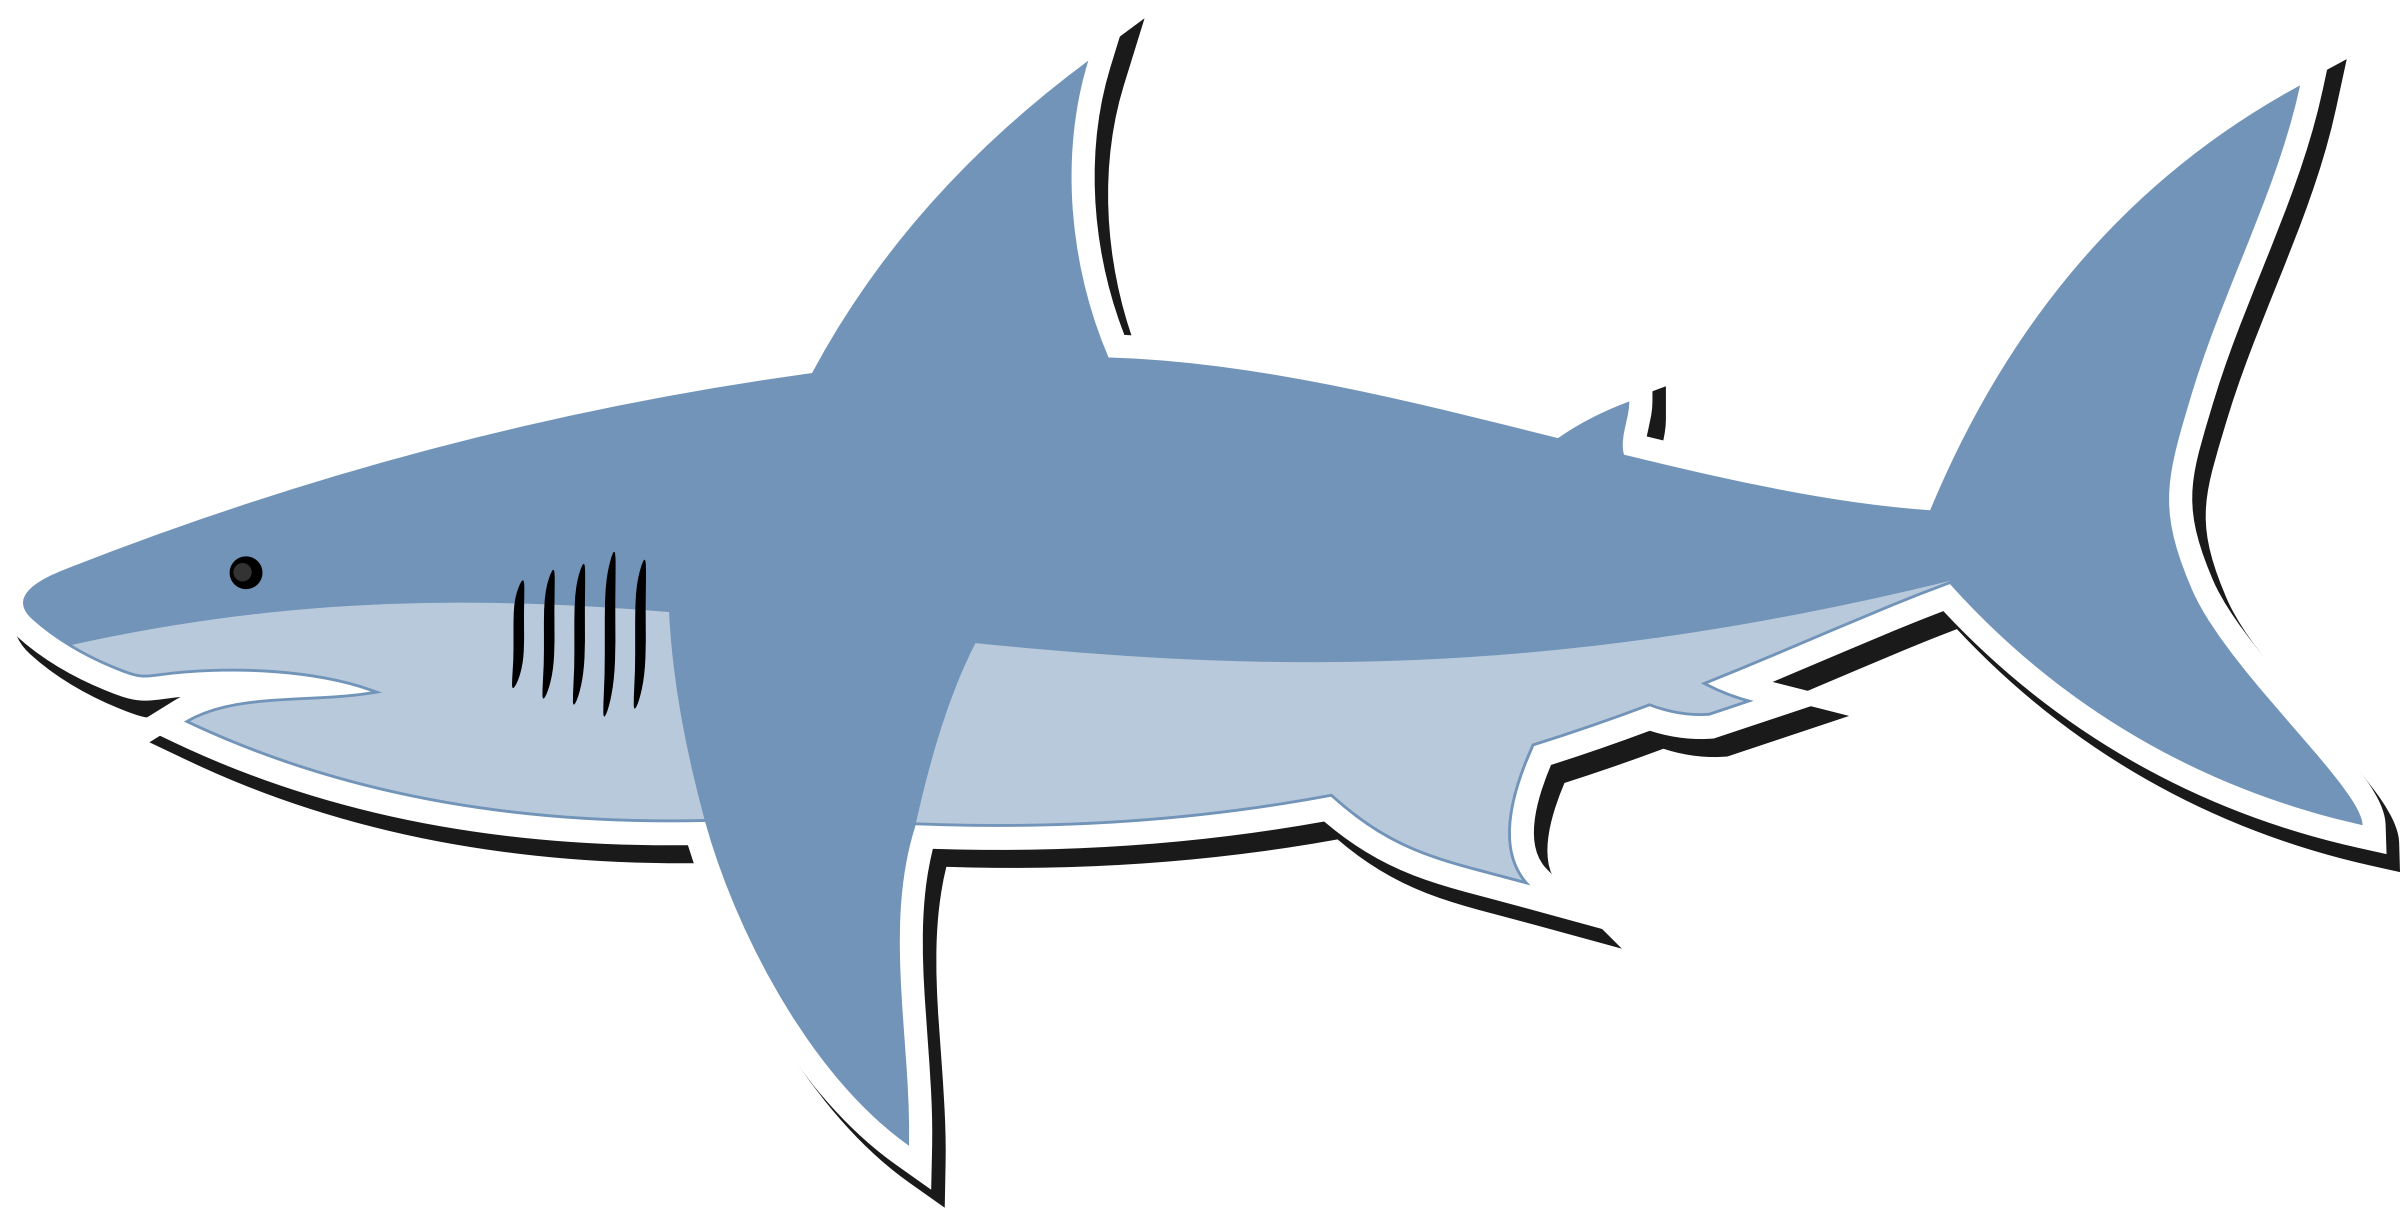 Shark cartoon clipart jpg royalty free Clipart cartoon shark png 2 - Cliparting.com jpg royalty free